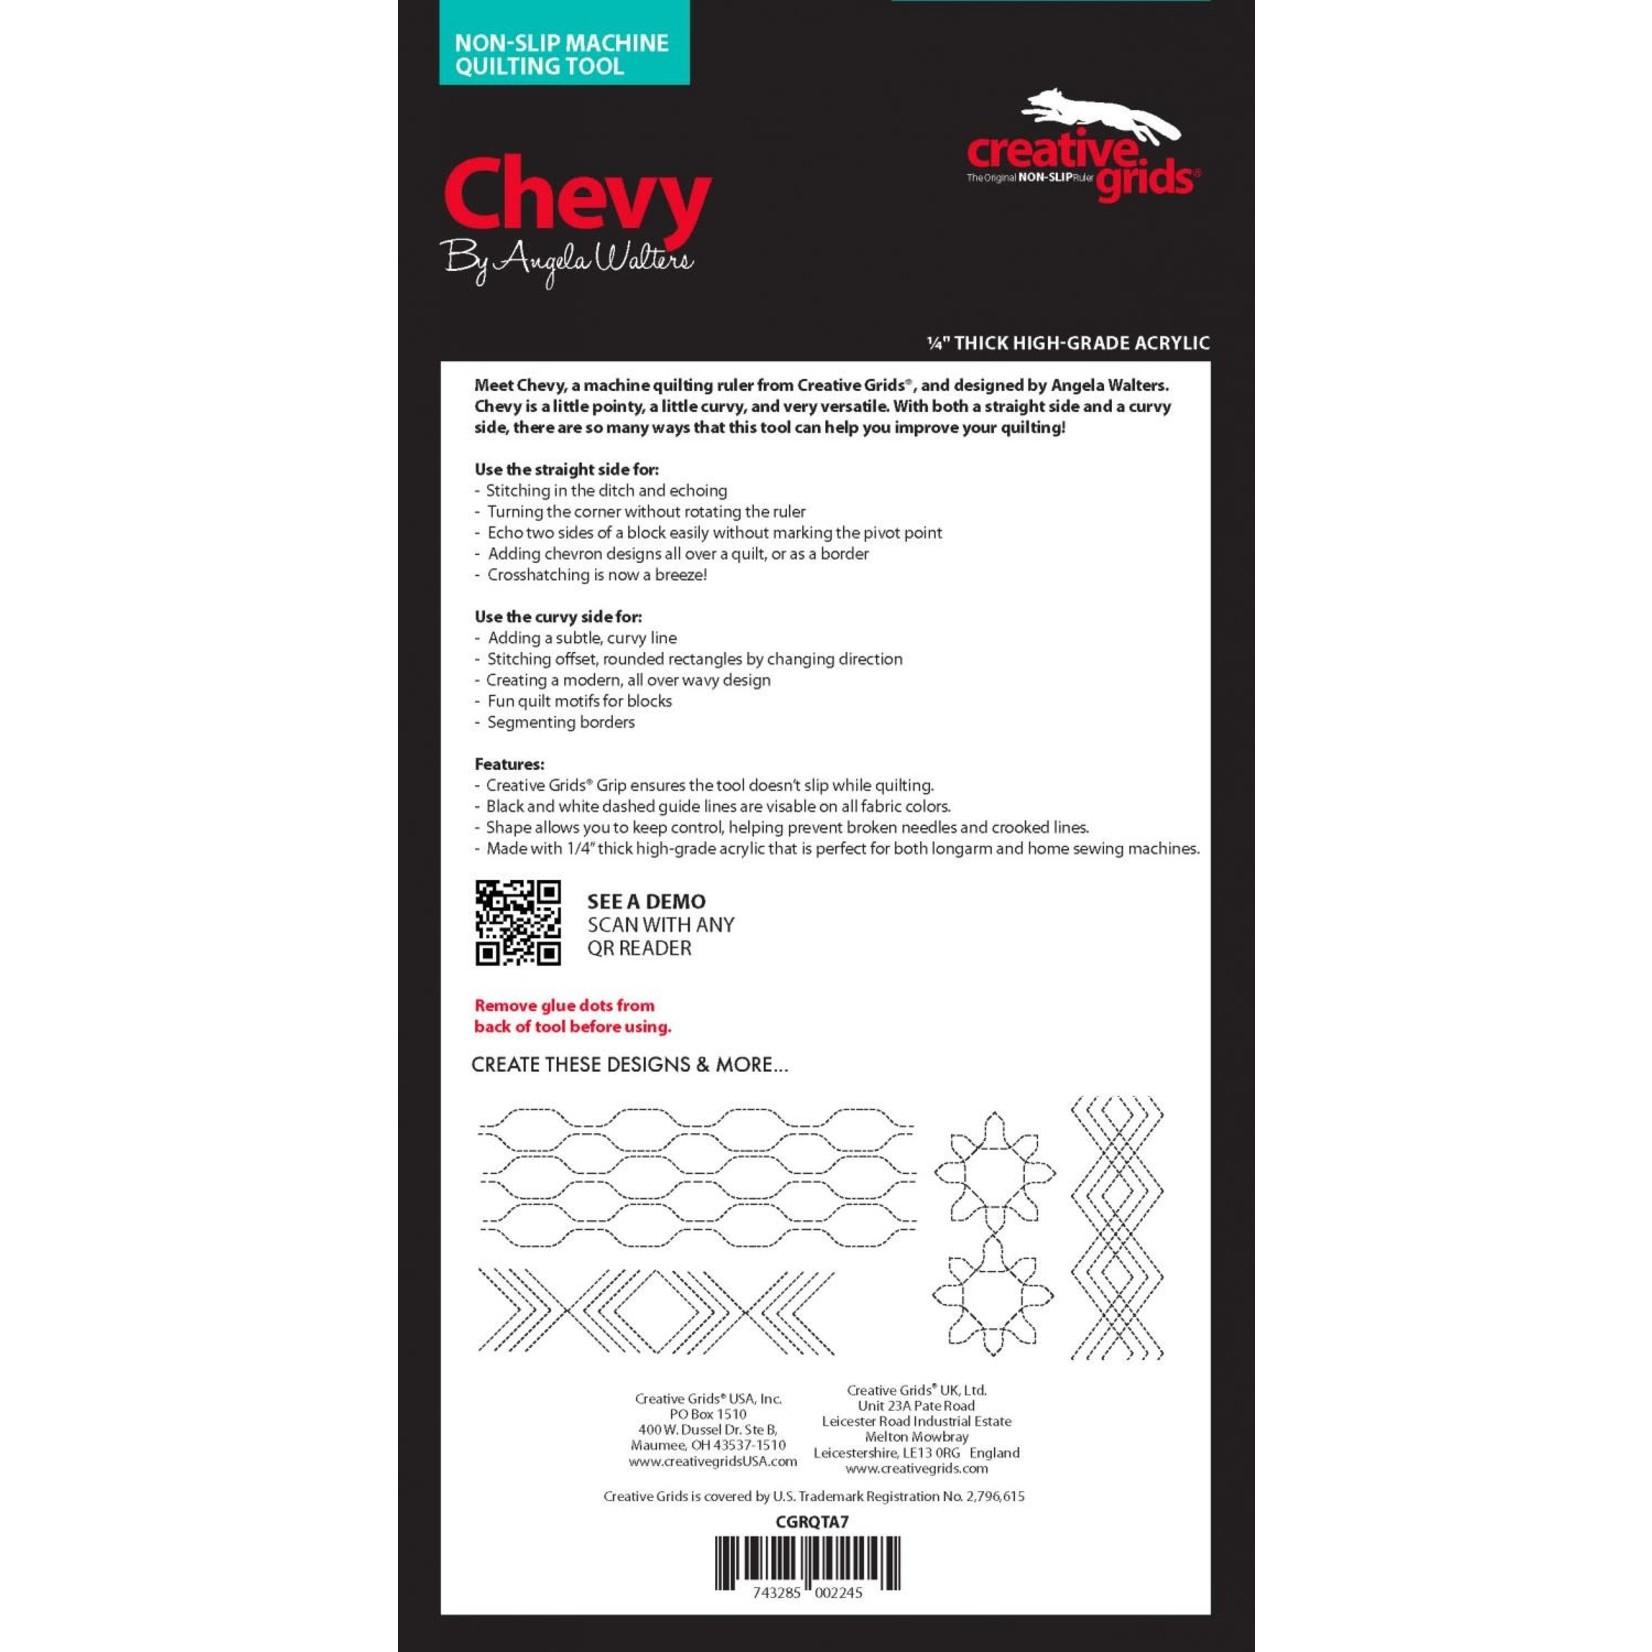 Creative Grids Creative Grids Chevy Ruler CGRQTA7